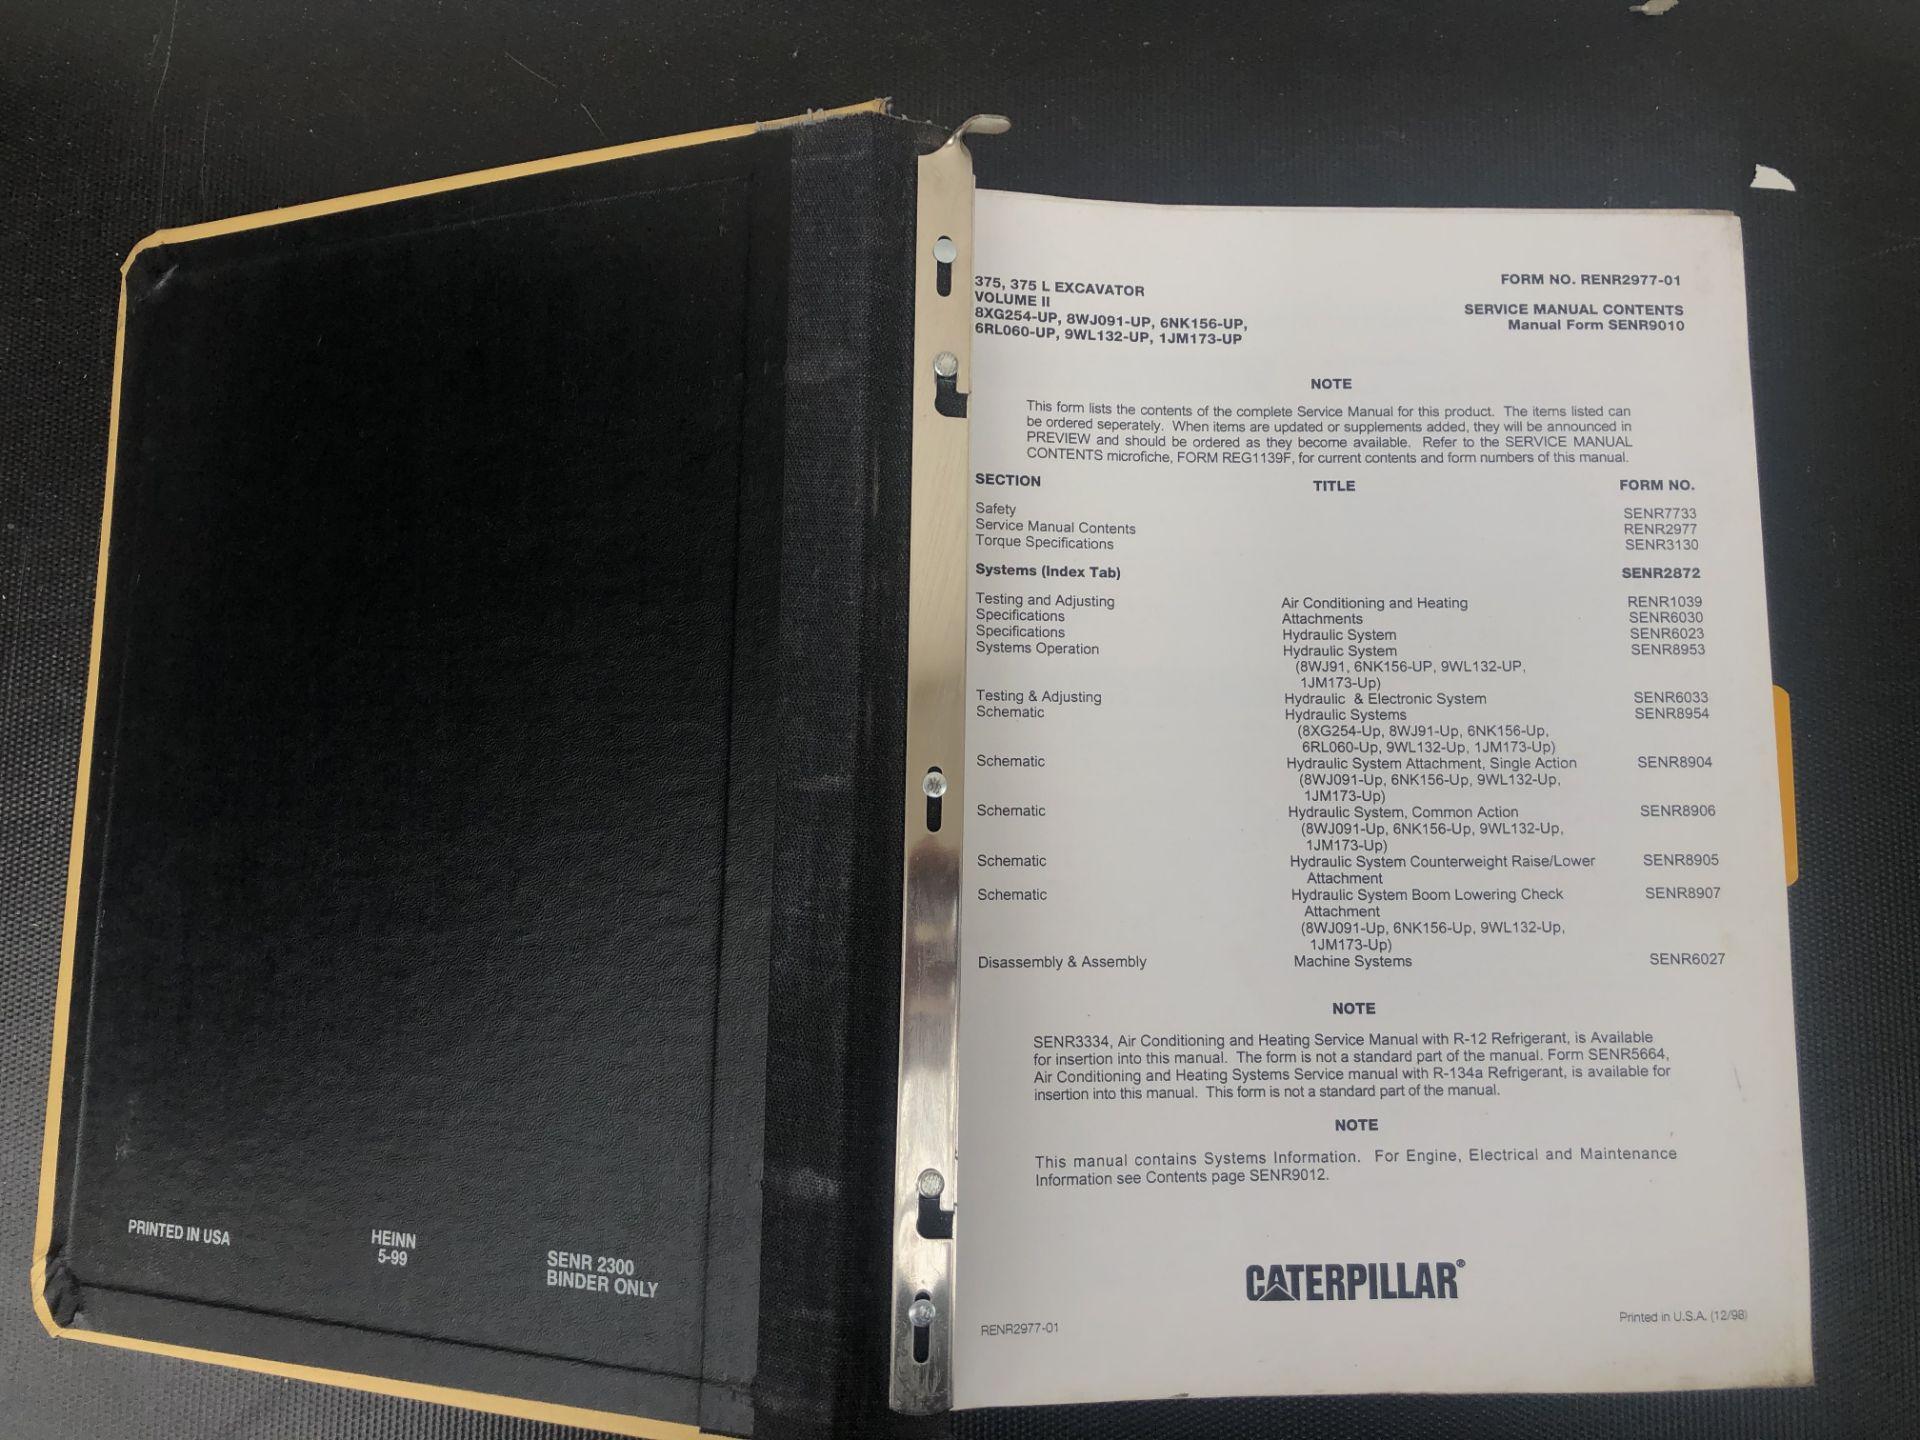 CATERPILLAR 375 375L VOLUME II SERVICE MANUAL, GENUINE FACTORY CAT WORKSHOP MANUAL - Image 3 of 3